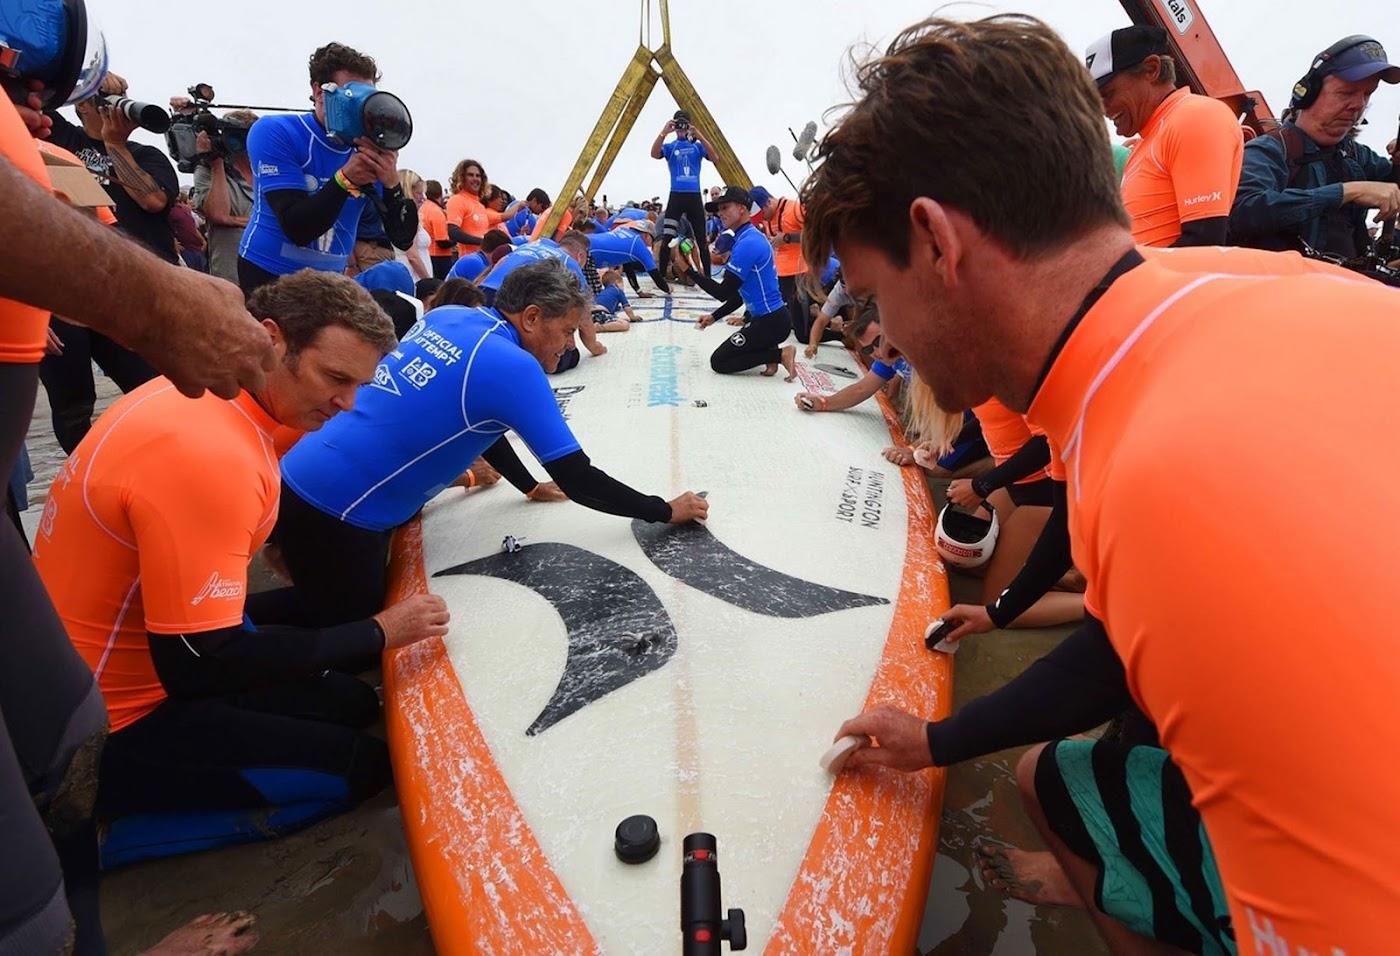 Worlds largest surfboard 02